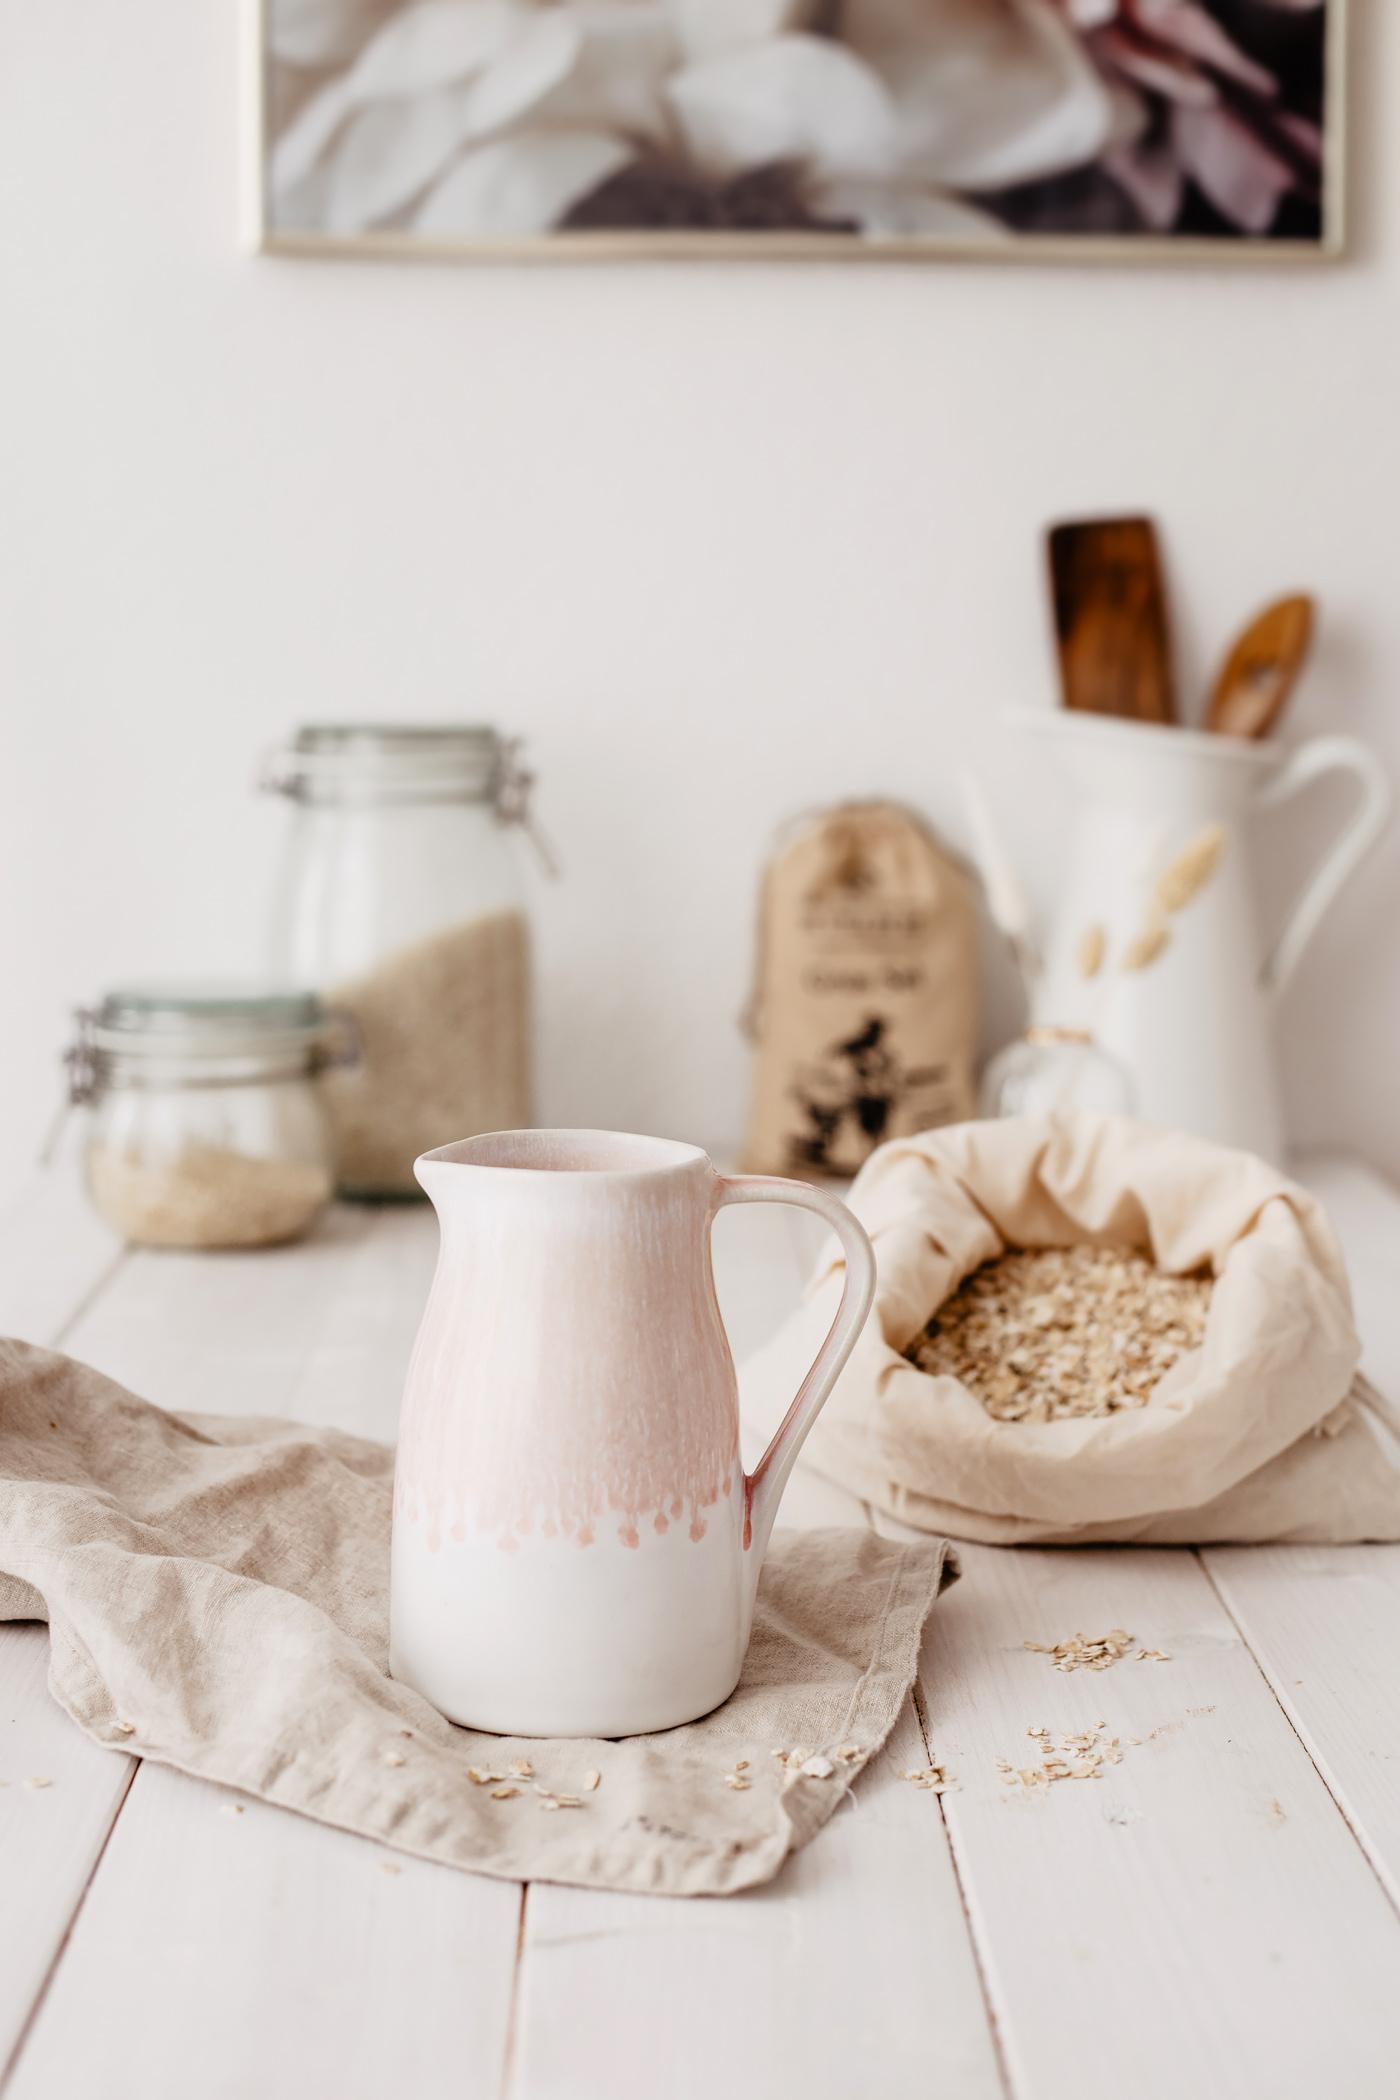 handgemacht keramik krug motel a miio rosa